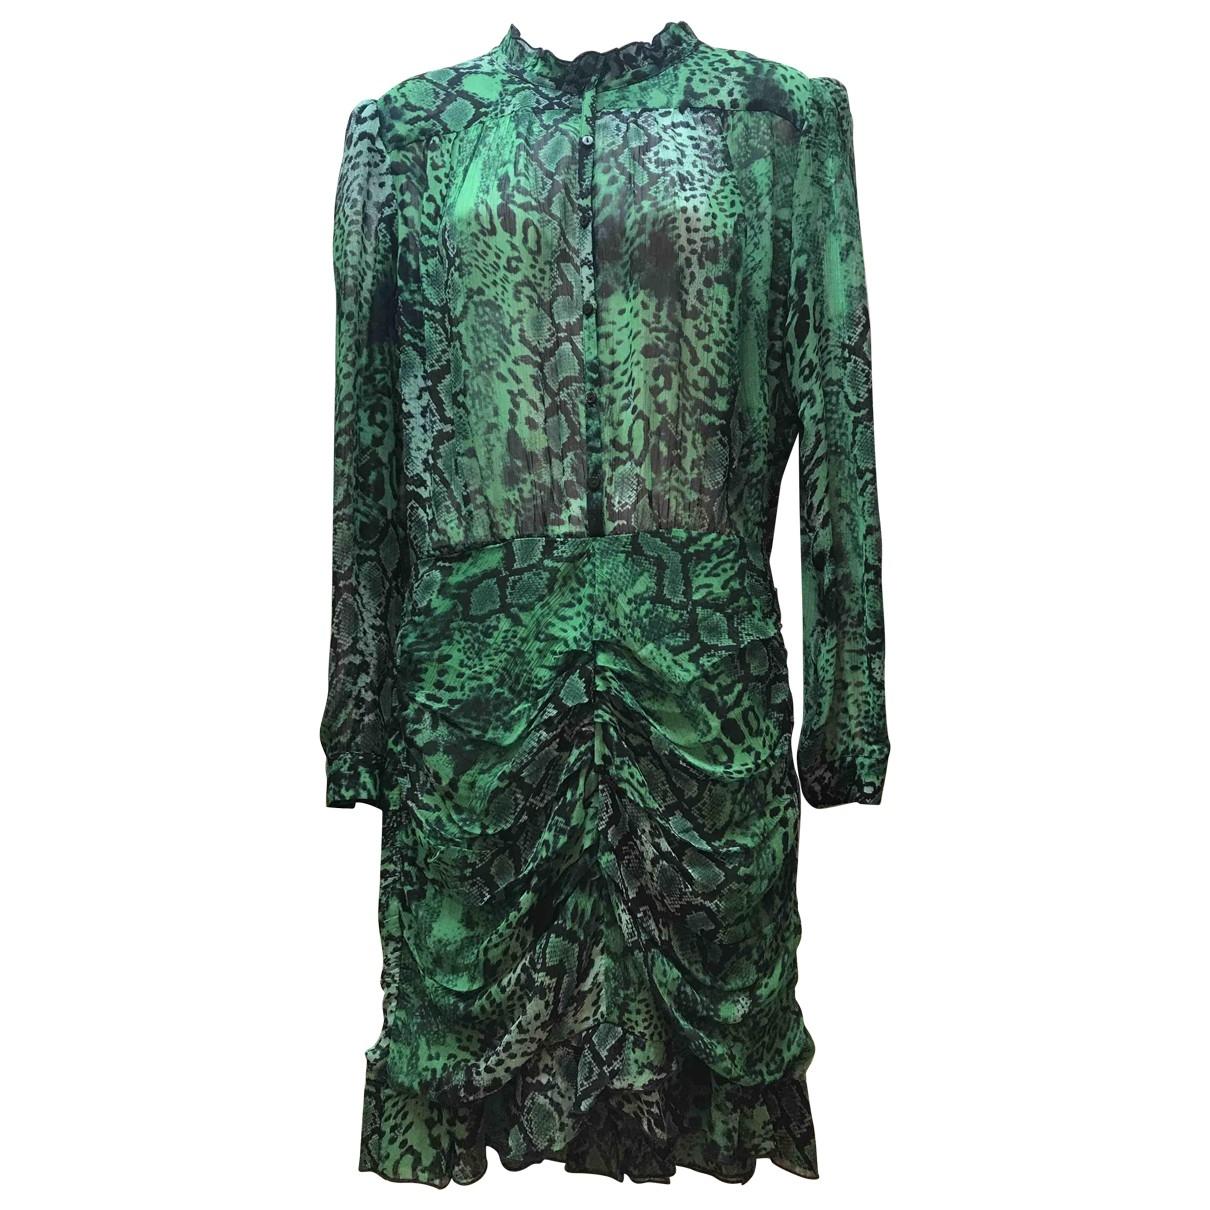 Ba&sh \N Green dress for Women 10 US